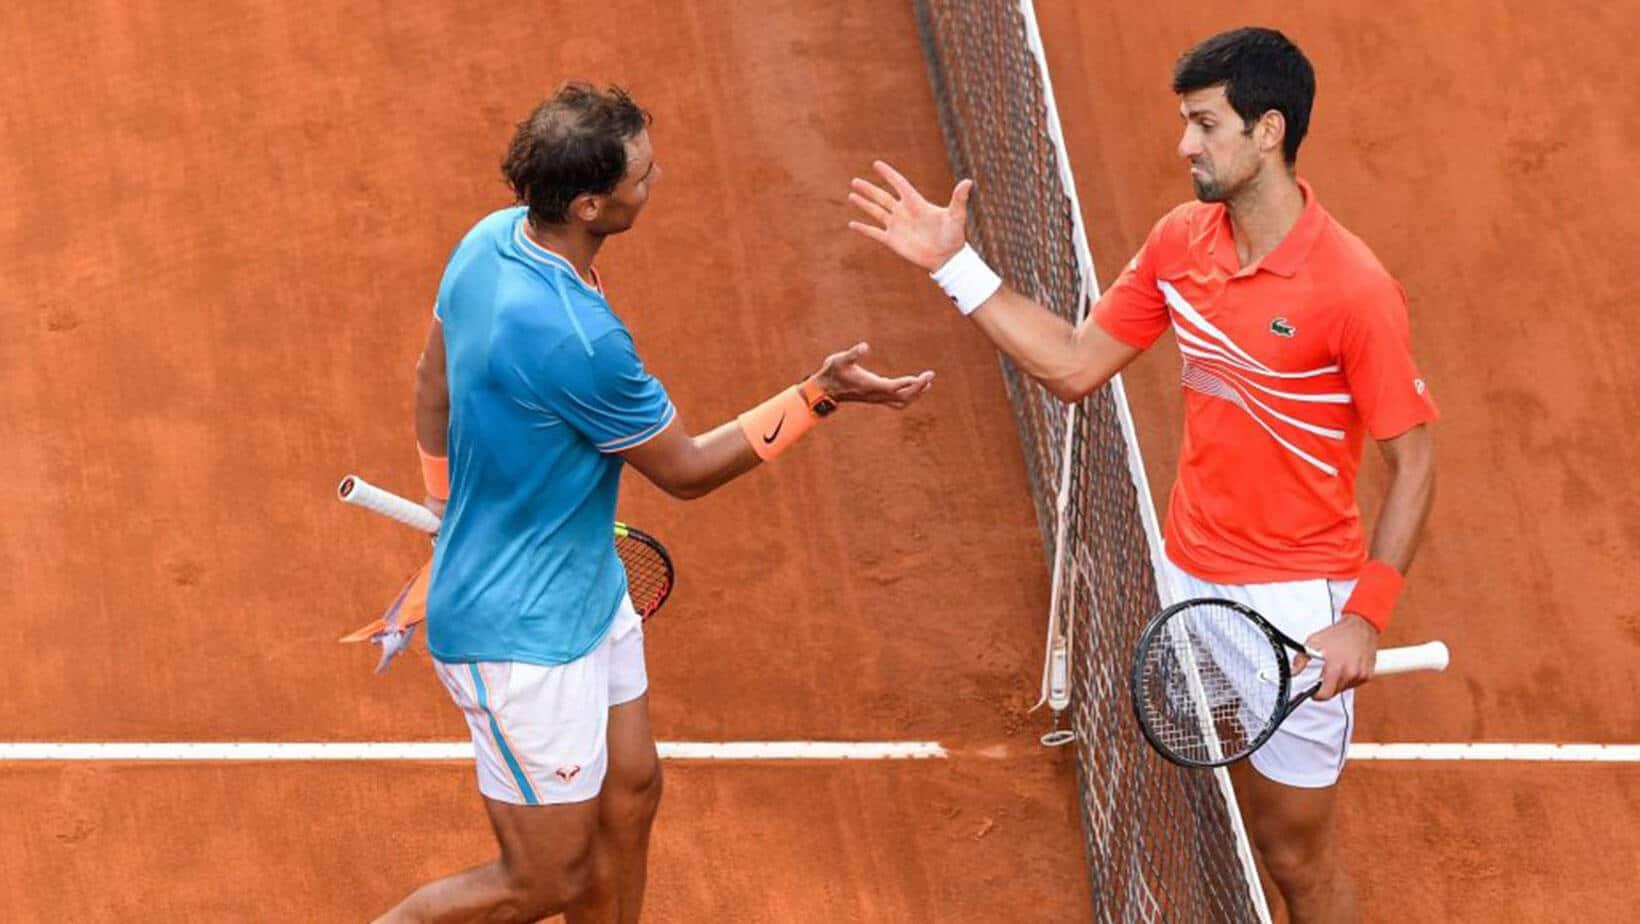 Novak Djokovic Meeting Rafael Nadal